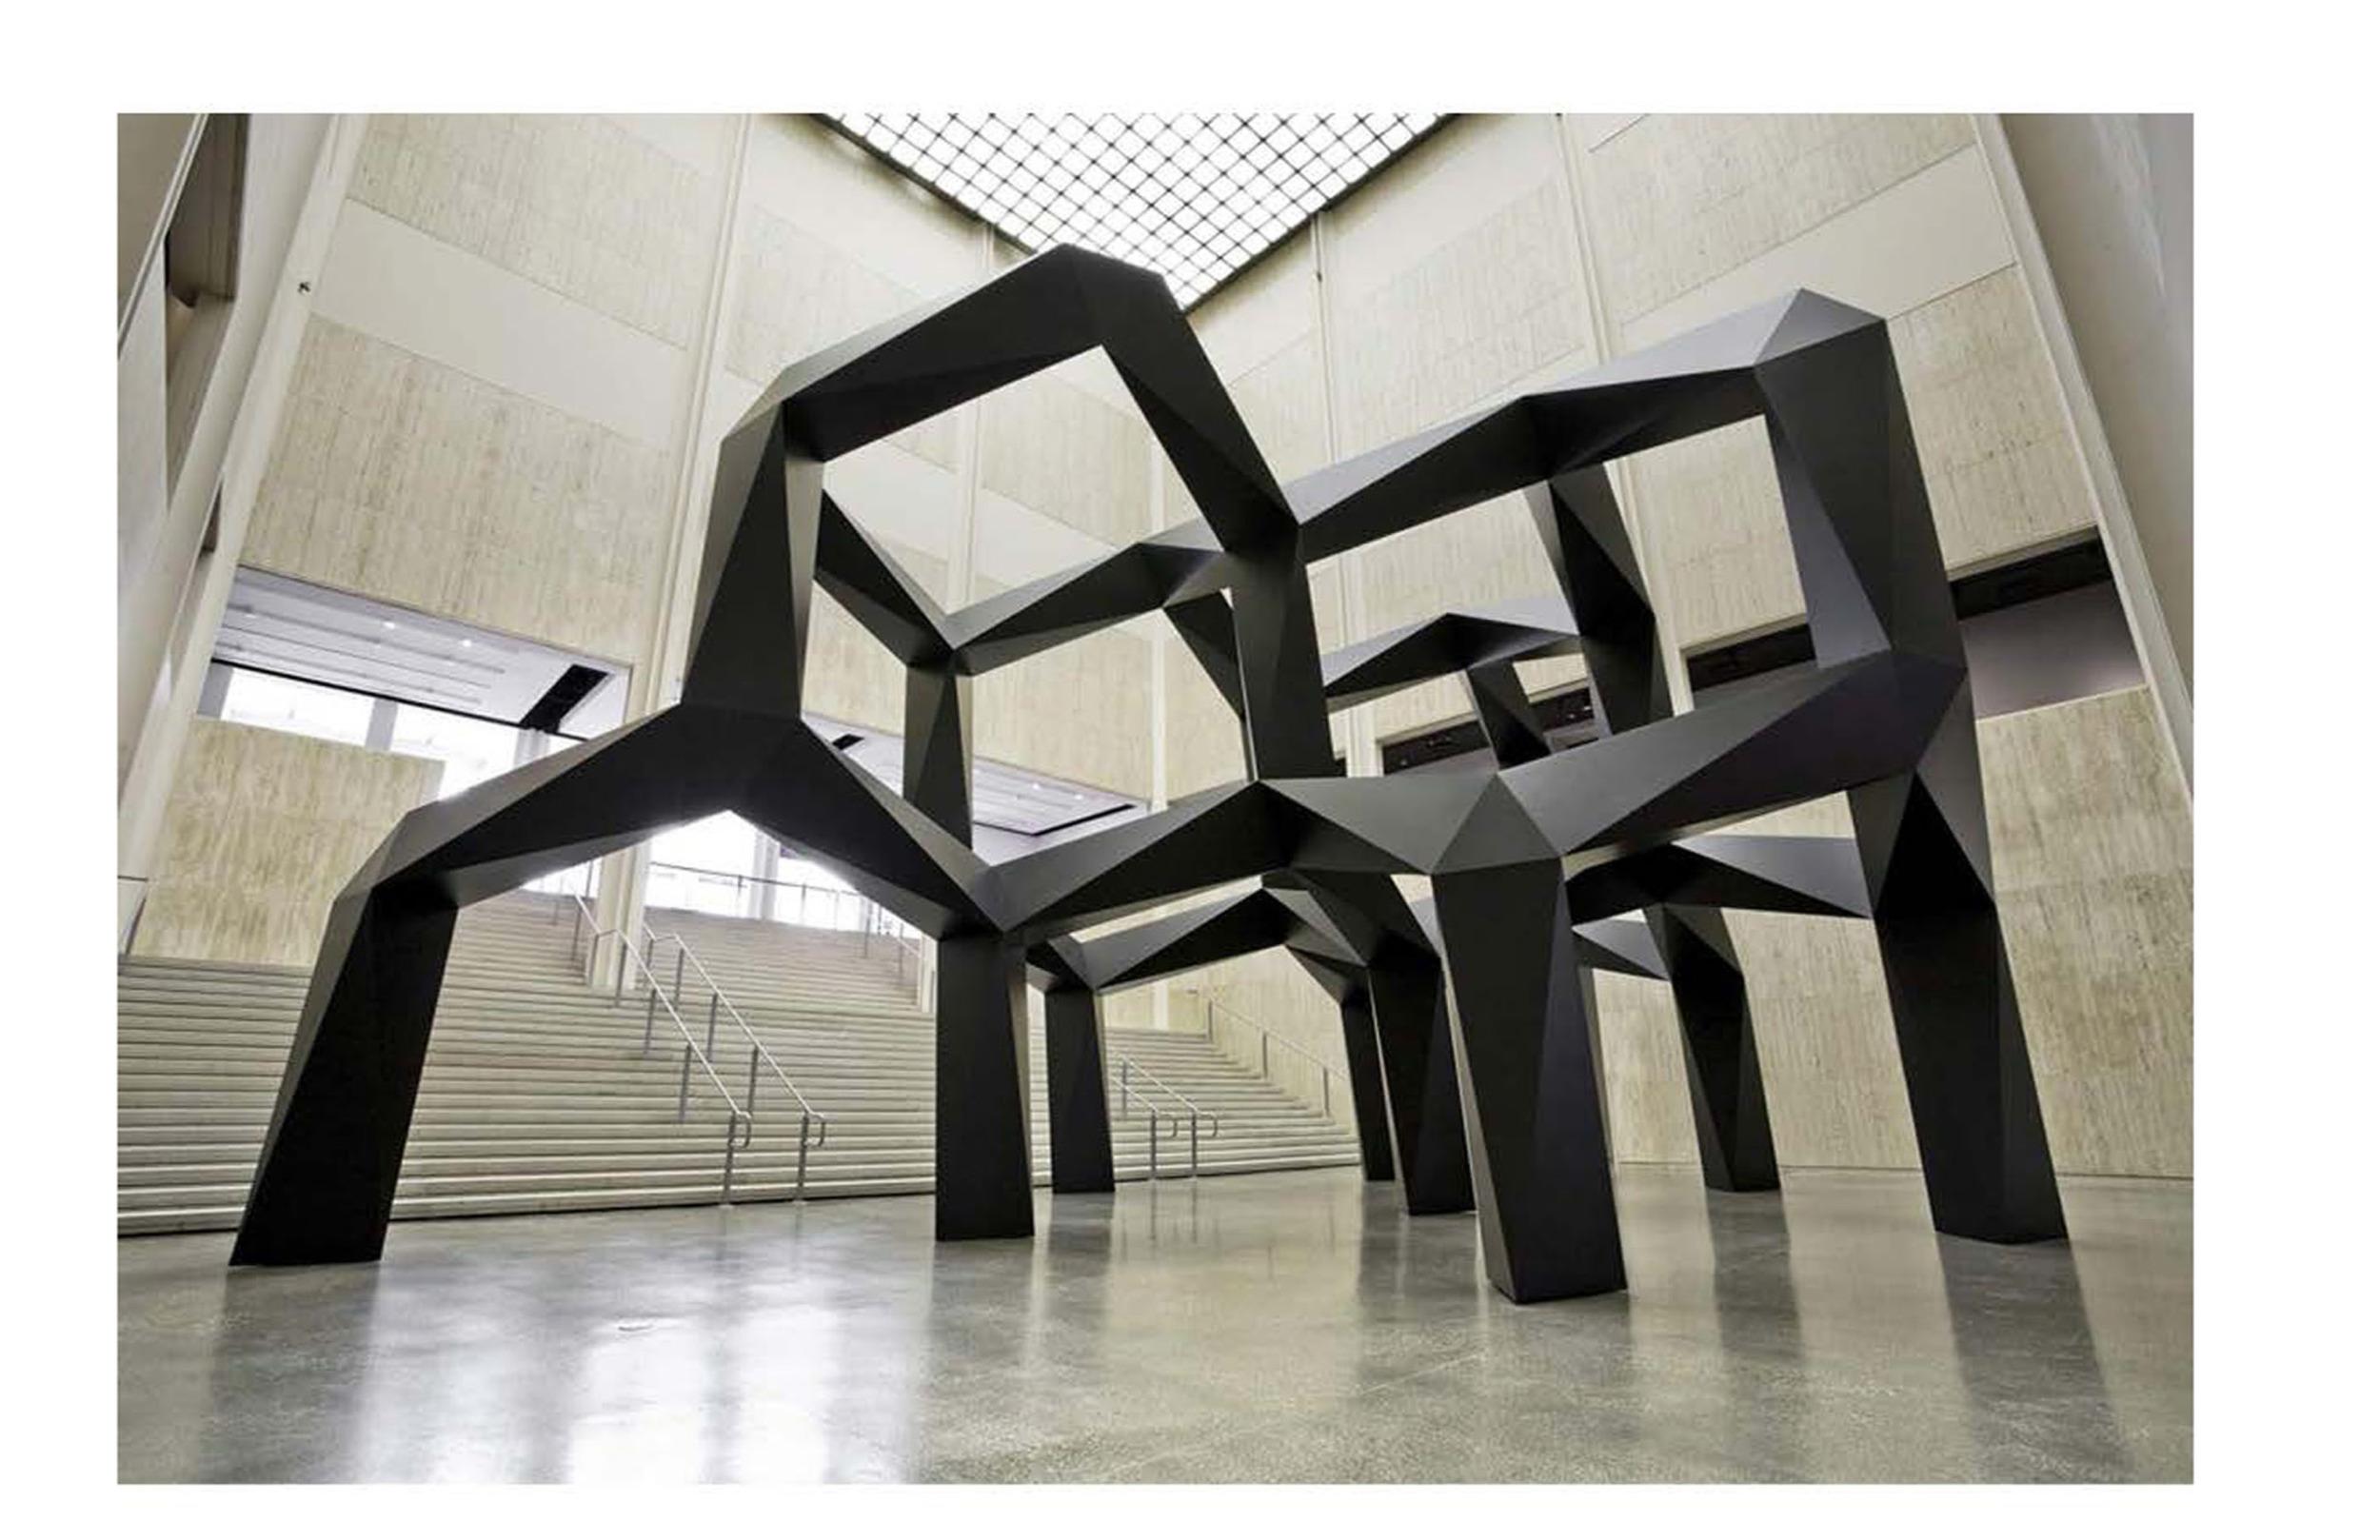 R_LACMA A+T Proposal_Original Sculpture.jpg